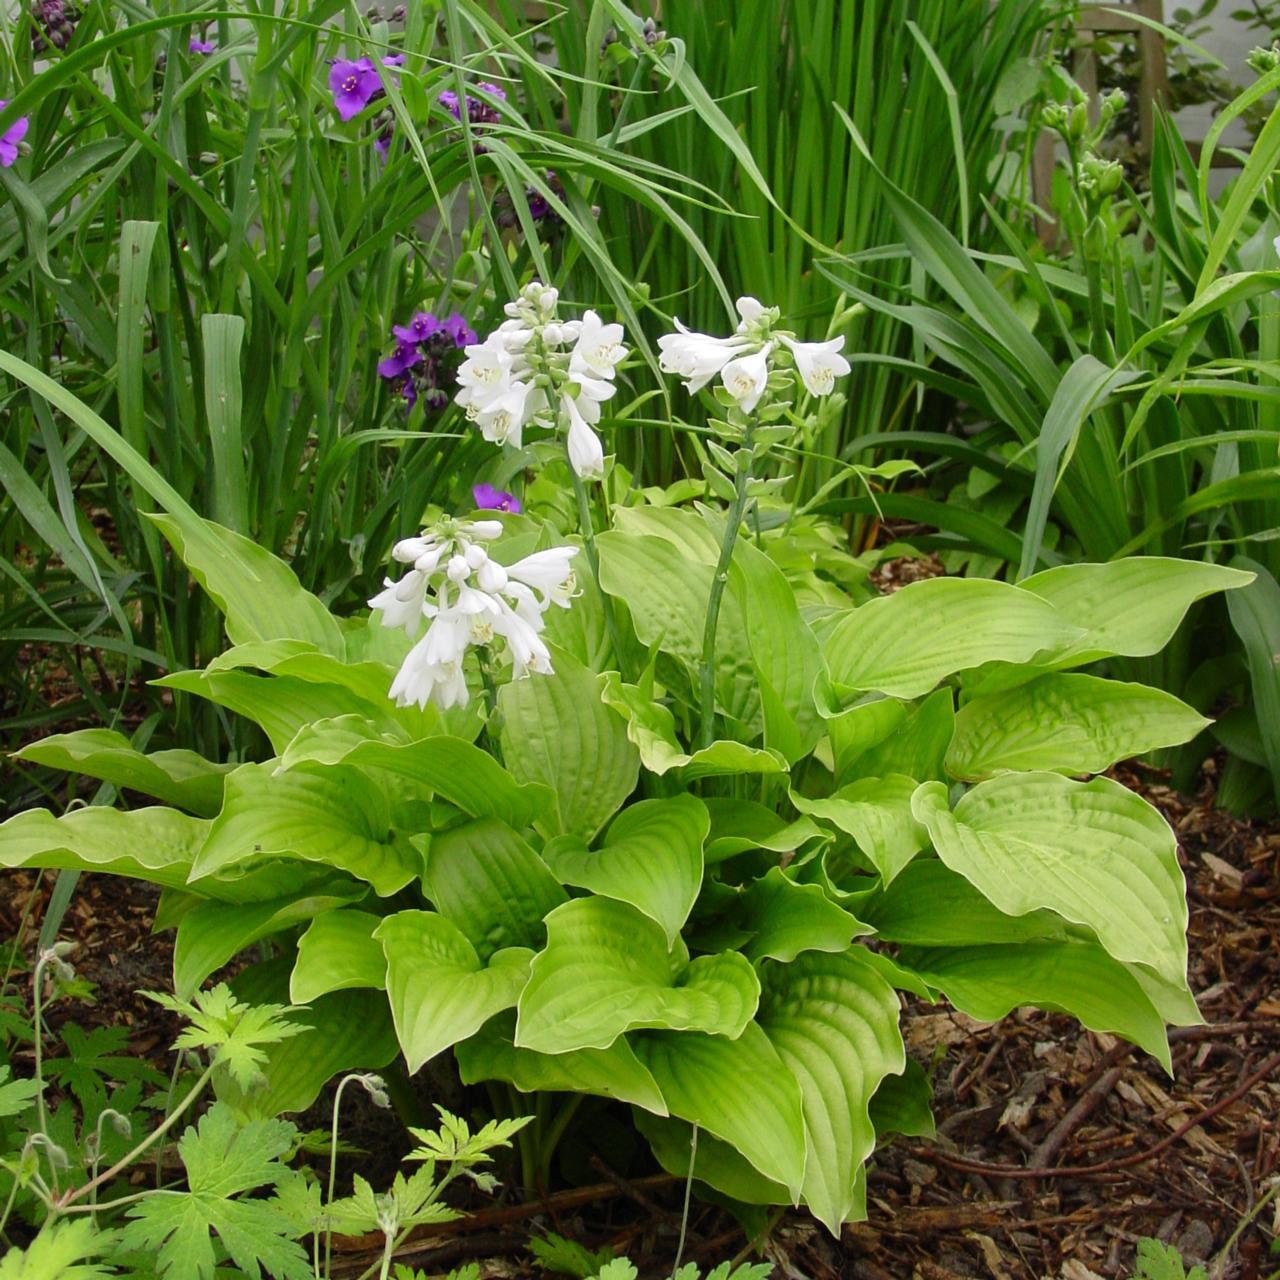 Hosta 'Royal Standard' plant